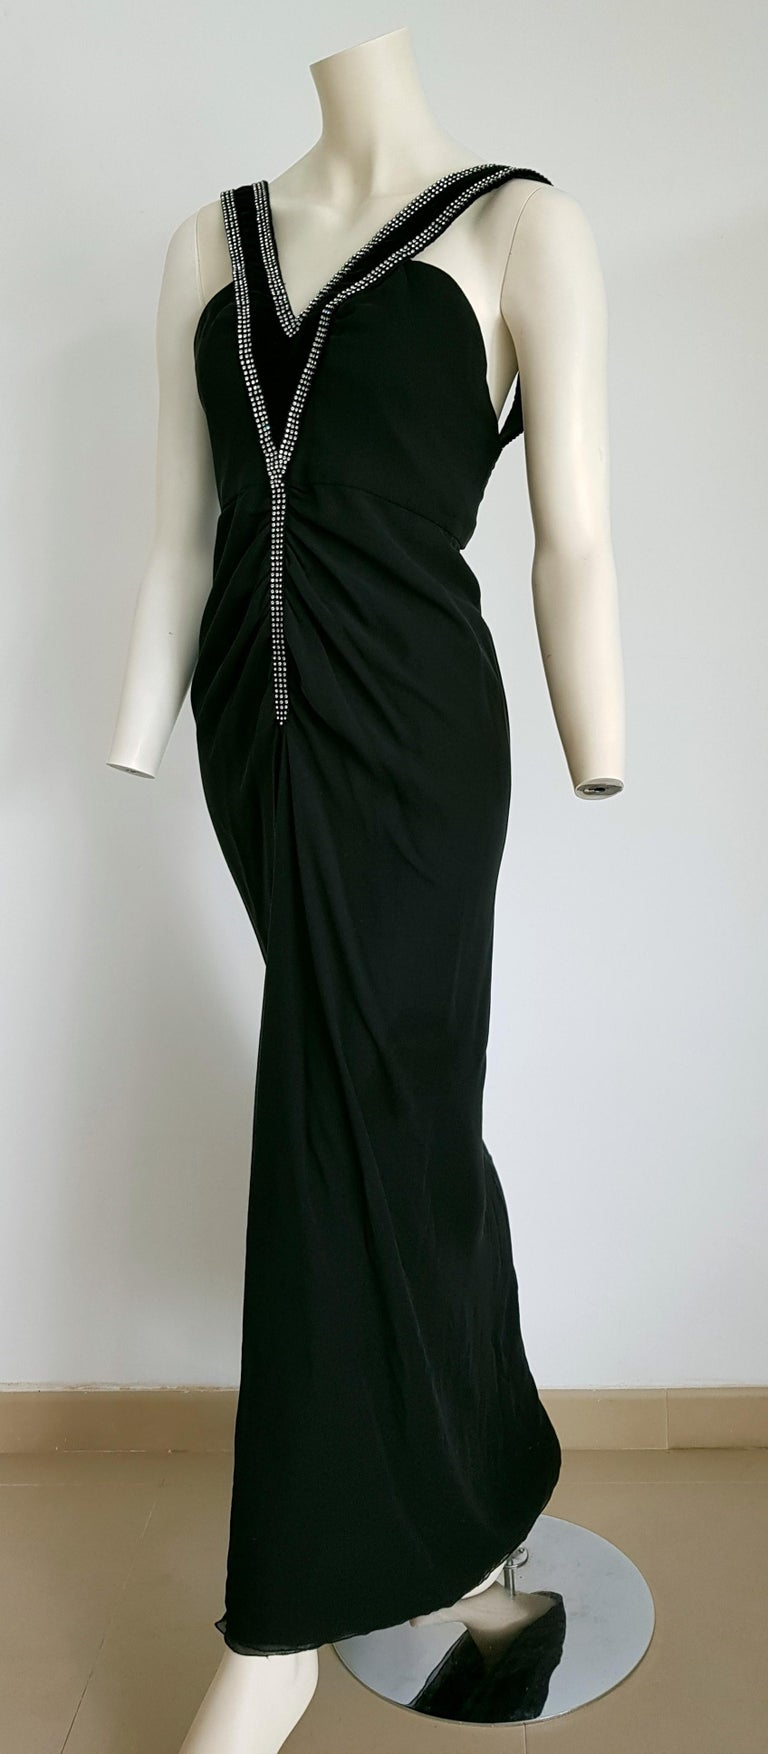 Black VALENTINO Haute Couture swarovski diamonds on black hems silk gown - Unworn, new For Sale